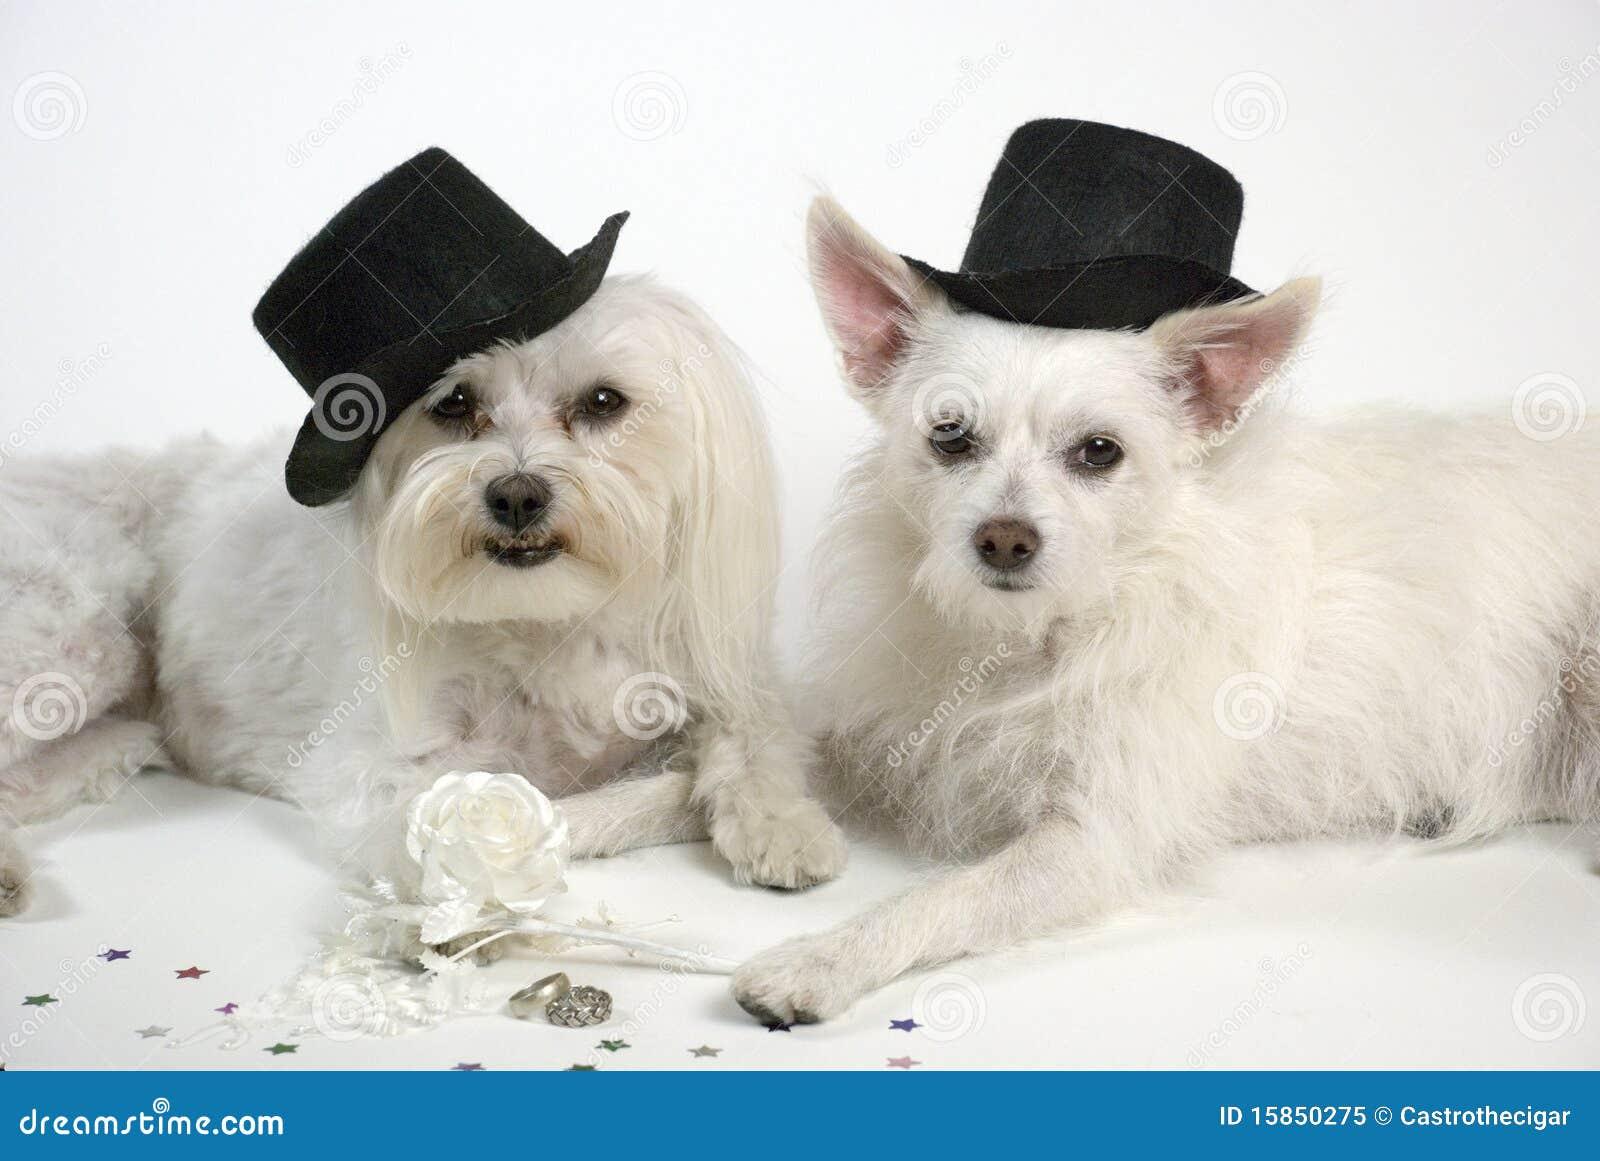 Hochzeits Hunde Stockbild Bild Von Nett Stieg Hunde 15850275